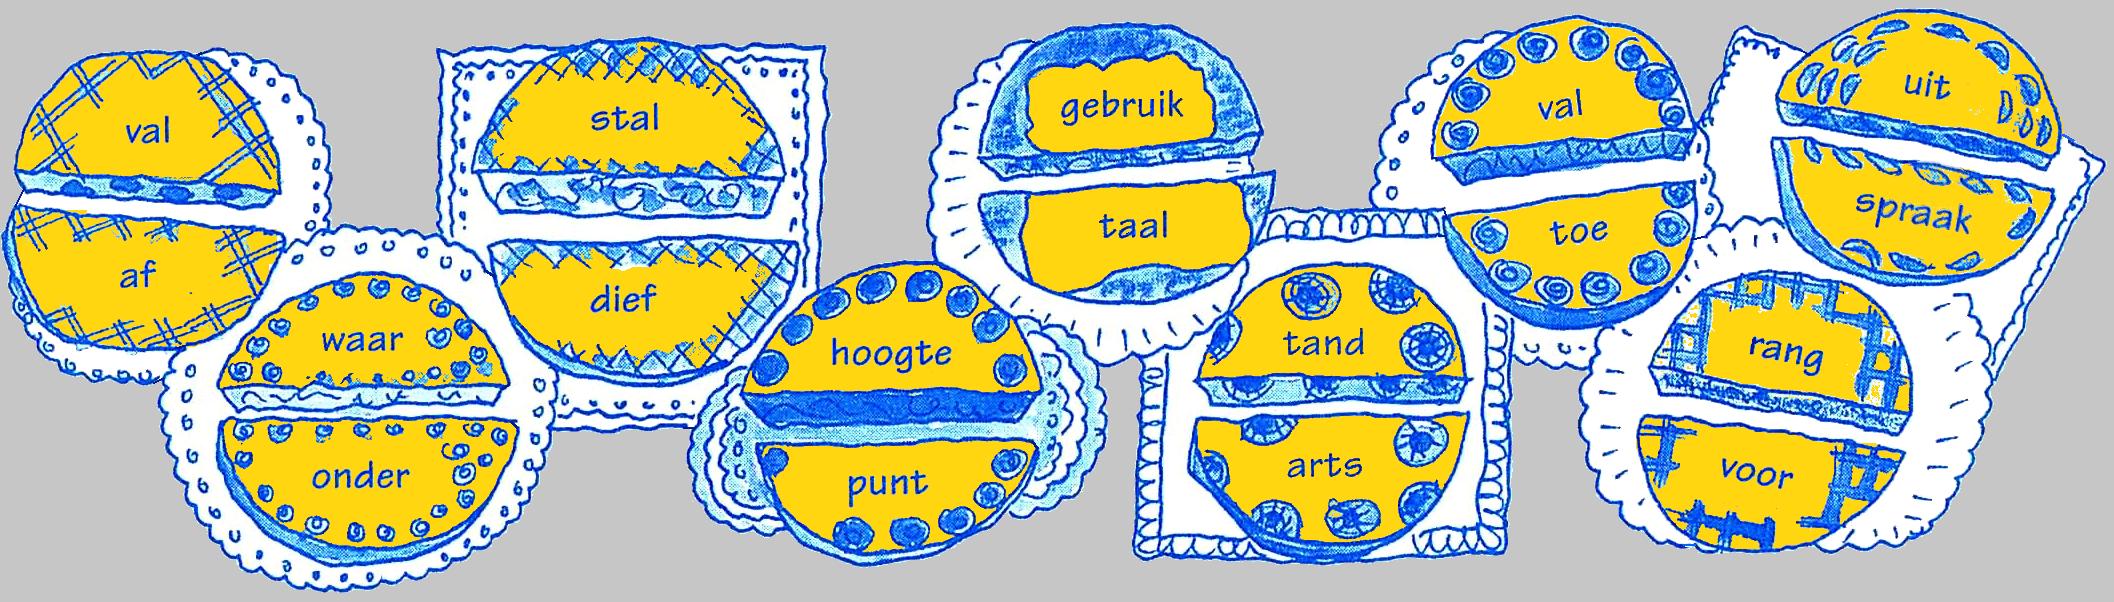 Taal actief spelling groep 6